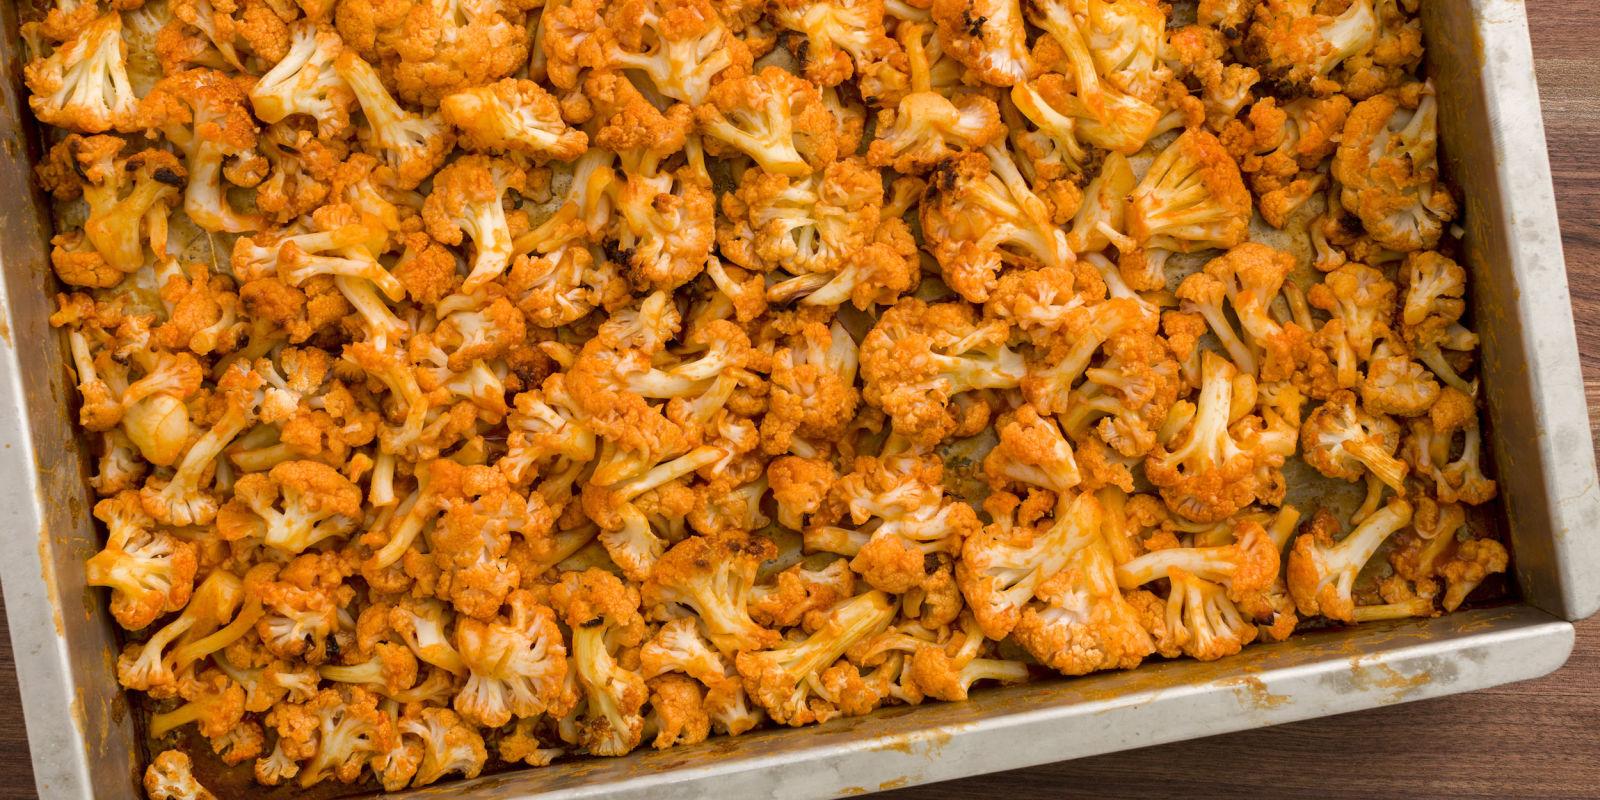 Best Buffalo Roasted Cauliflower Recipe - How to Make Buffalo Roasted ...